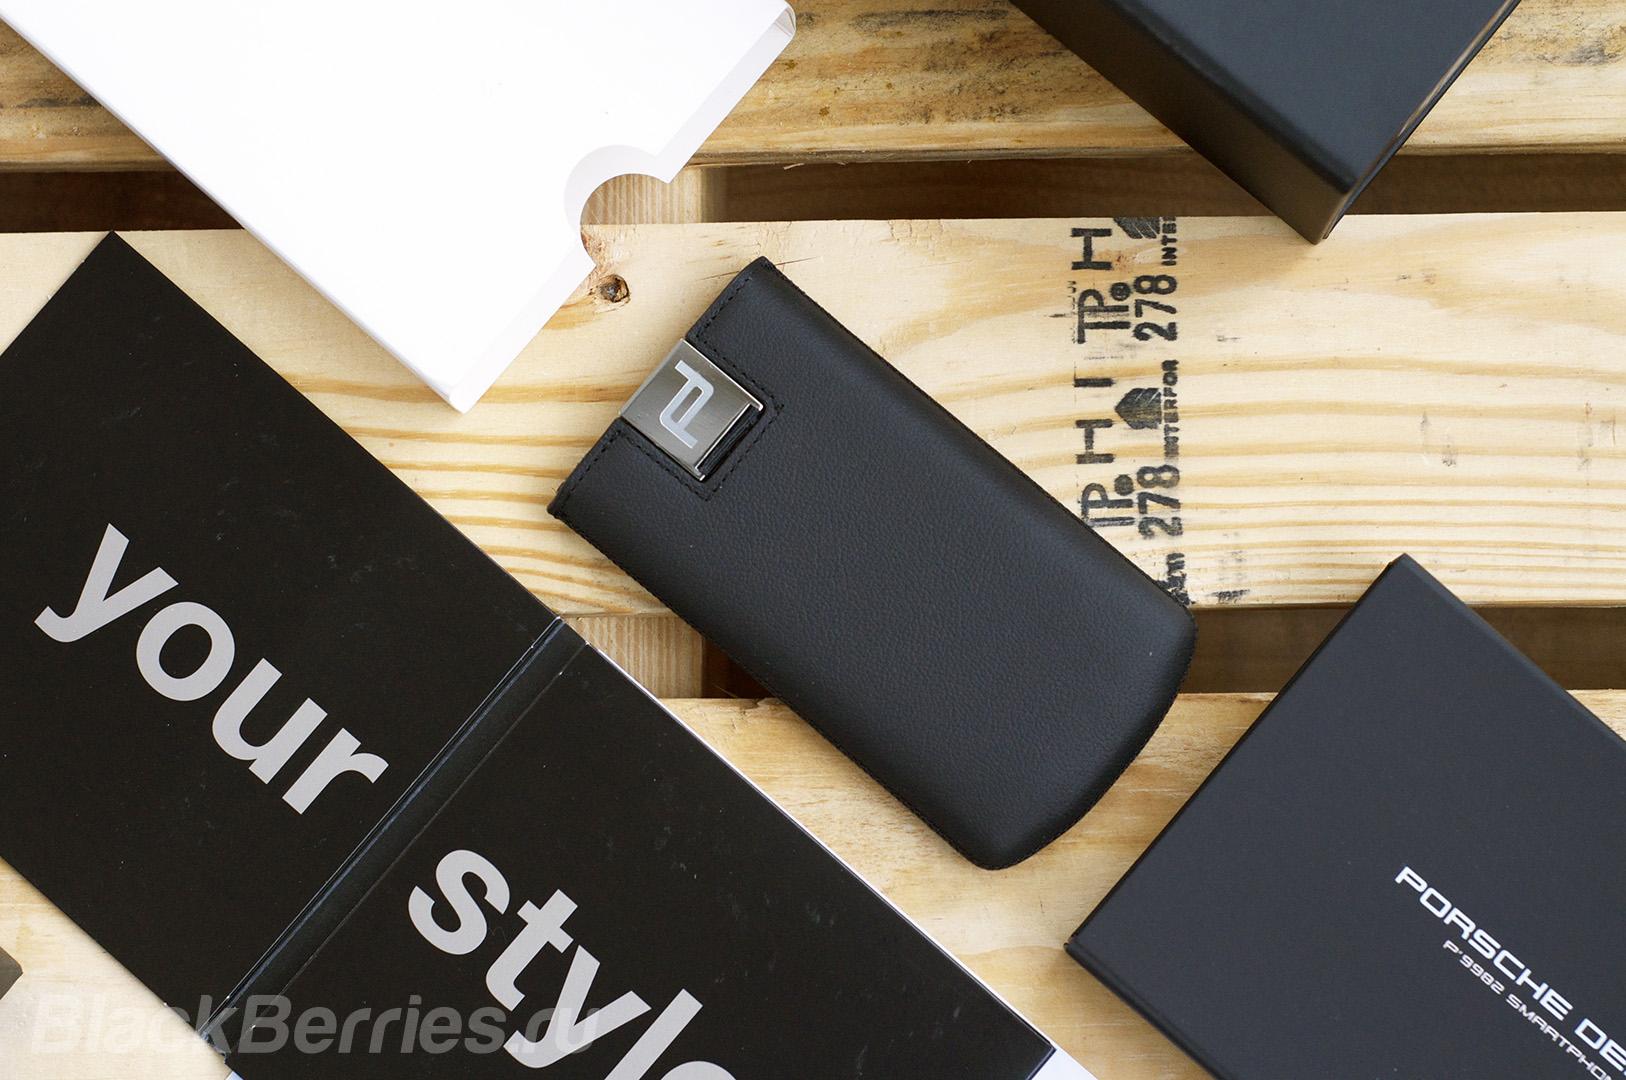 blackberry-porsche-design-case-covers-02